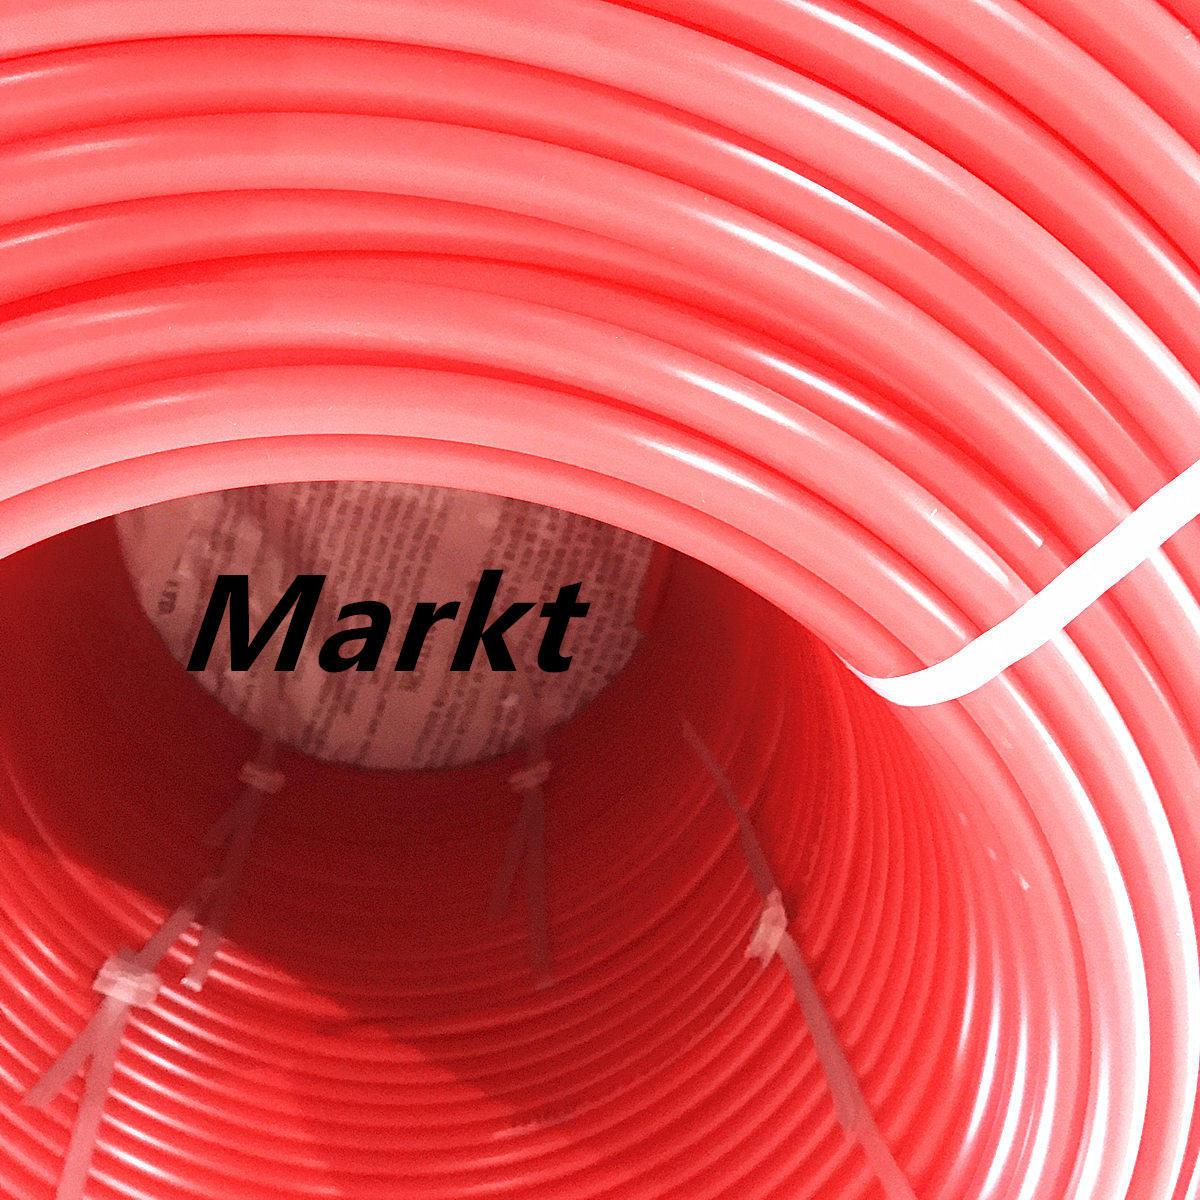 [Hot Item] as/Nzz 2492 Cross-Linked Polyethylene Pex Pipe for Pressure  Applications